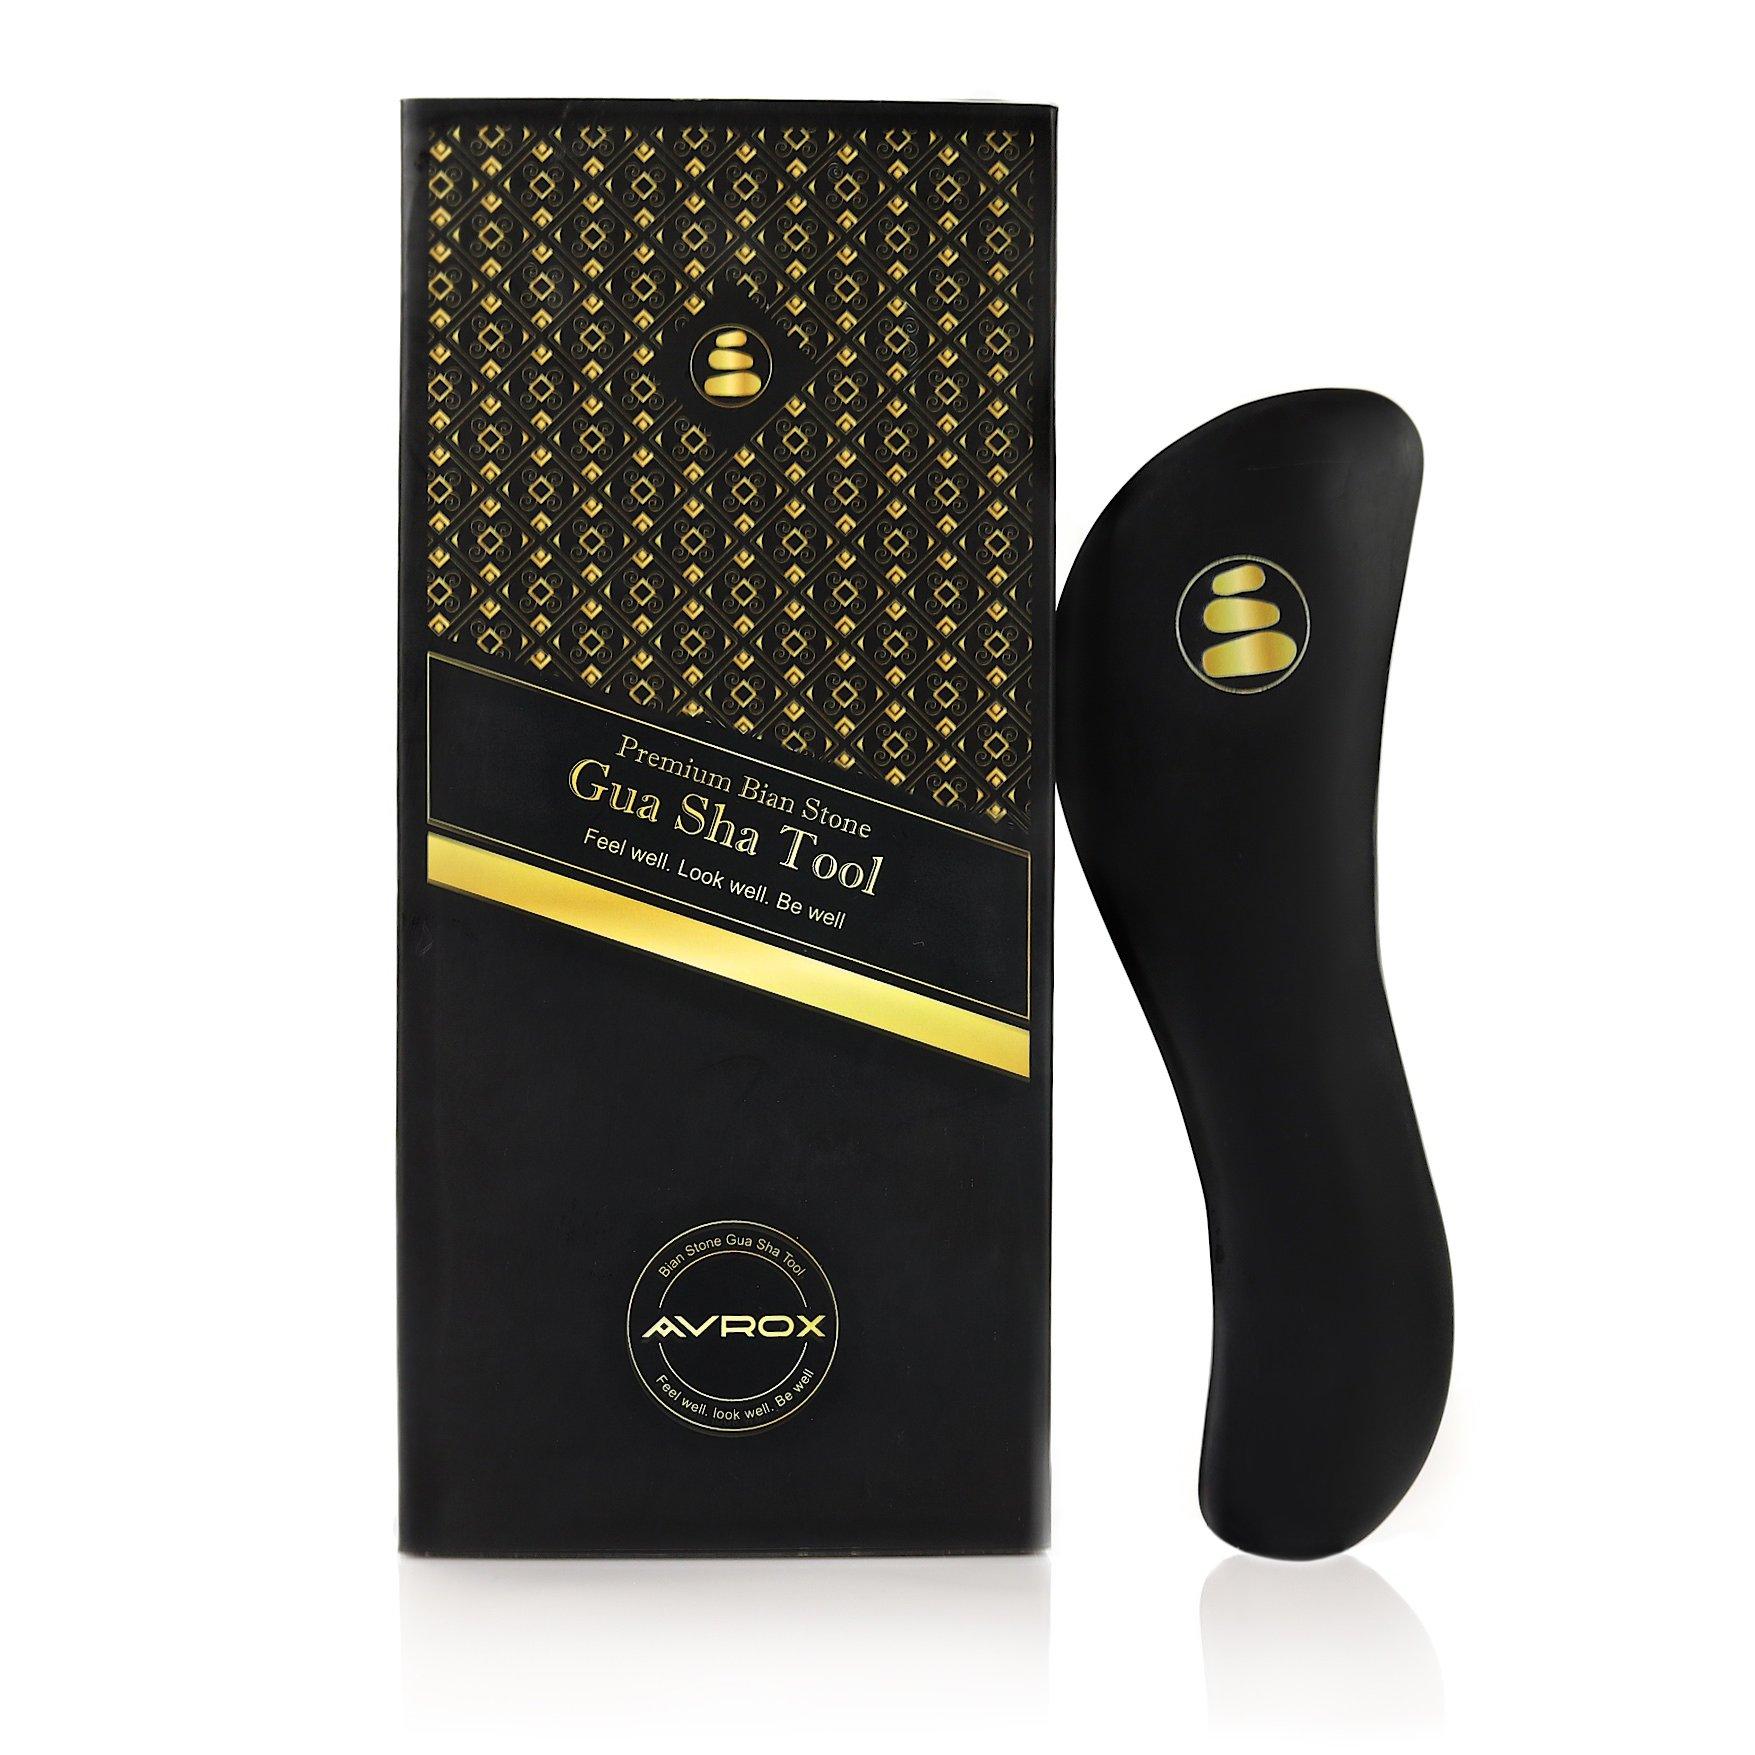 AVROX 7'' Bian Stone Gua Sha Tool: IASTM Tool/Graston Tools for Myofascial Release| Heavy, Easy Grip Stone Guasha Board Facial Massager/Neck, Back & Leg Pain Relief Tool| Top Gifting Idea